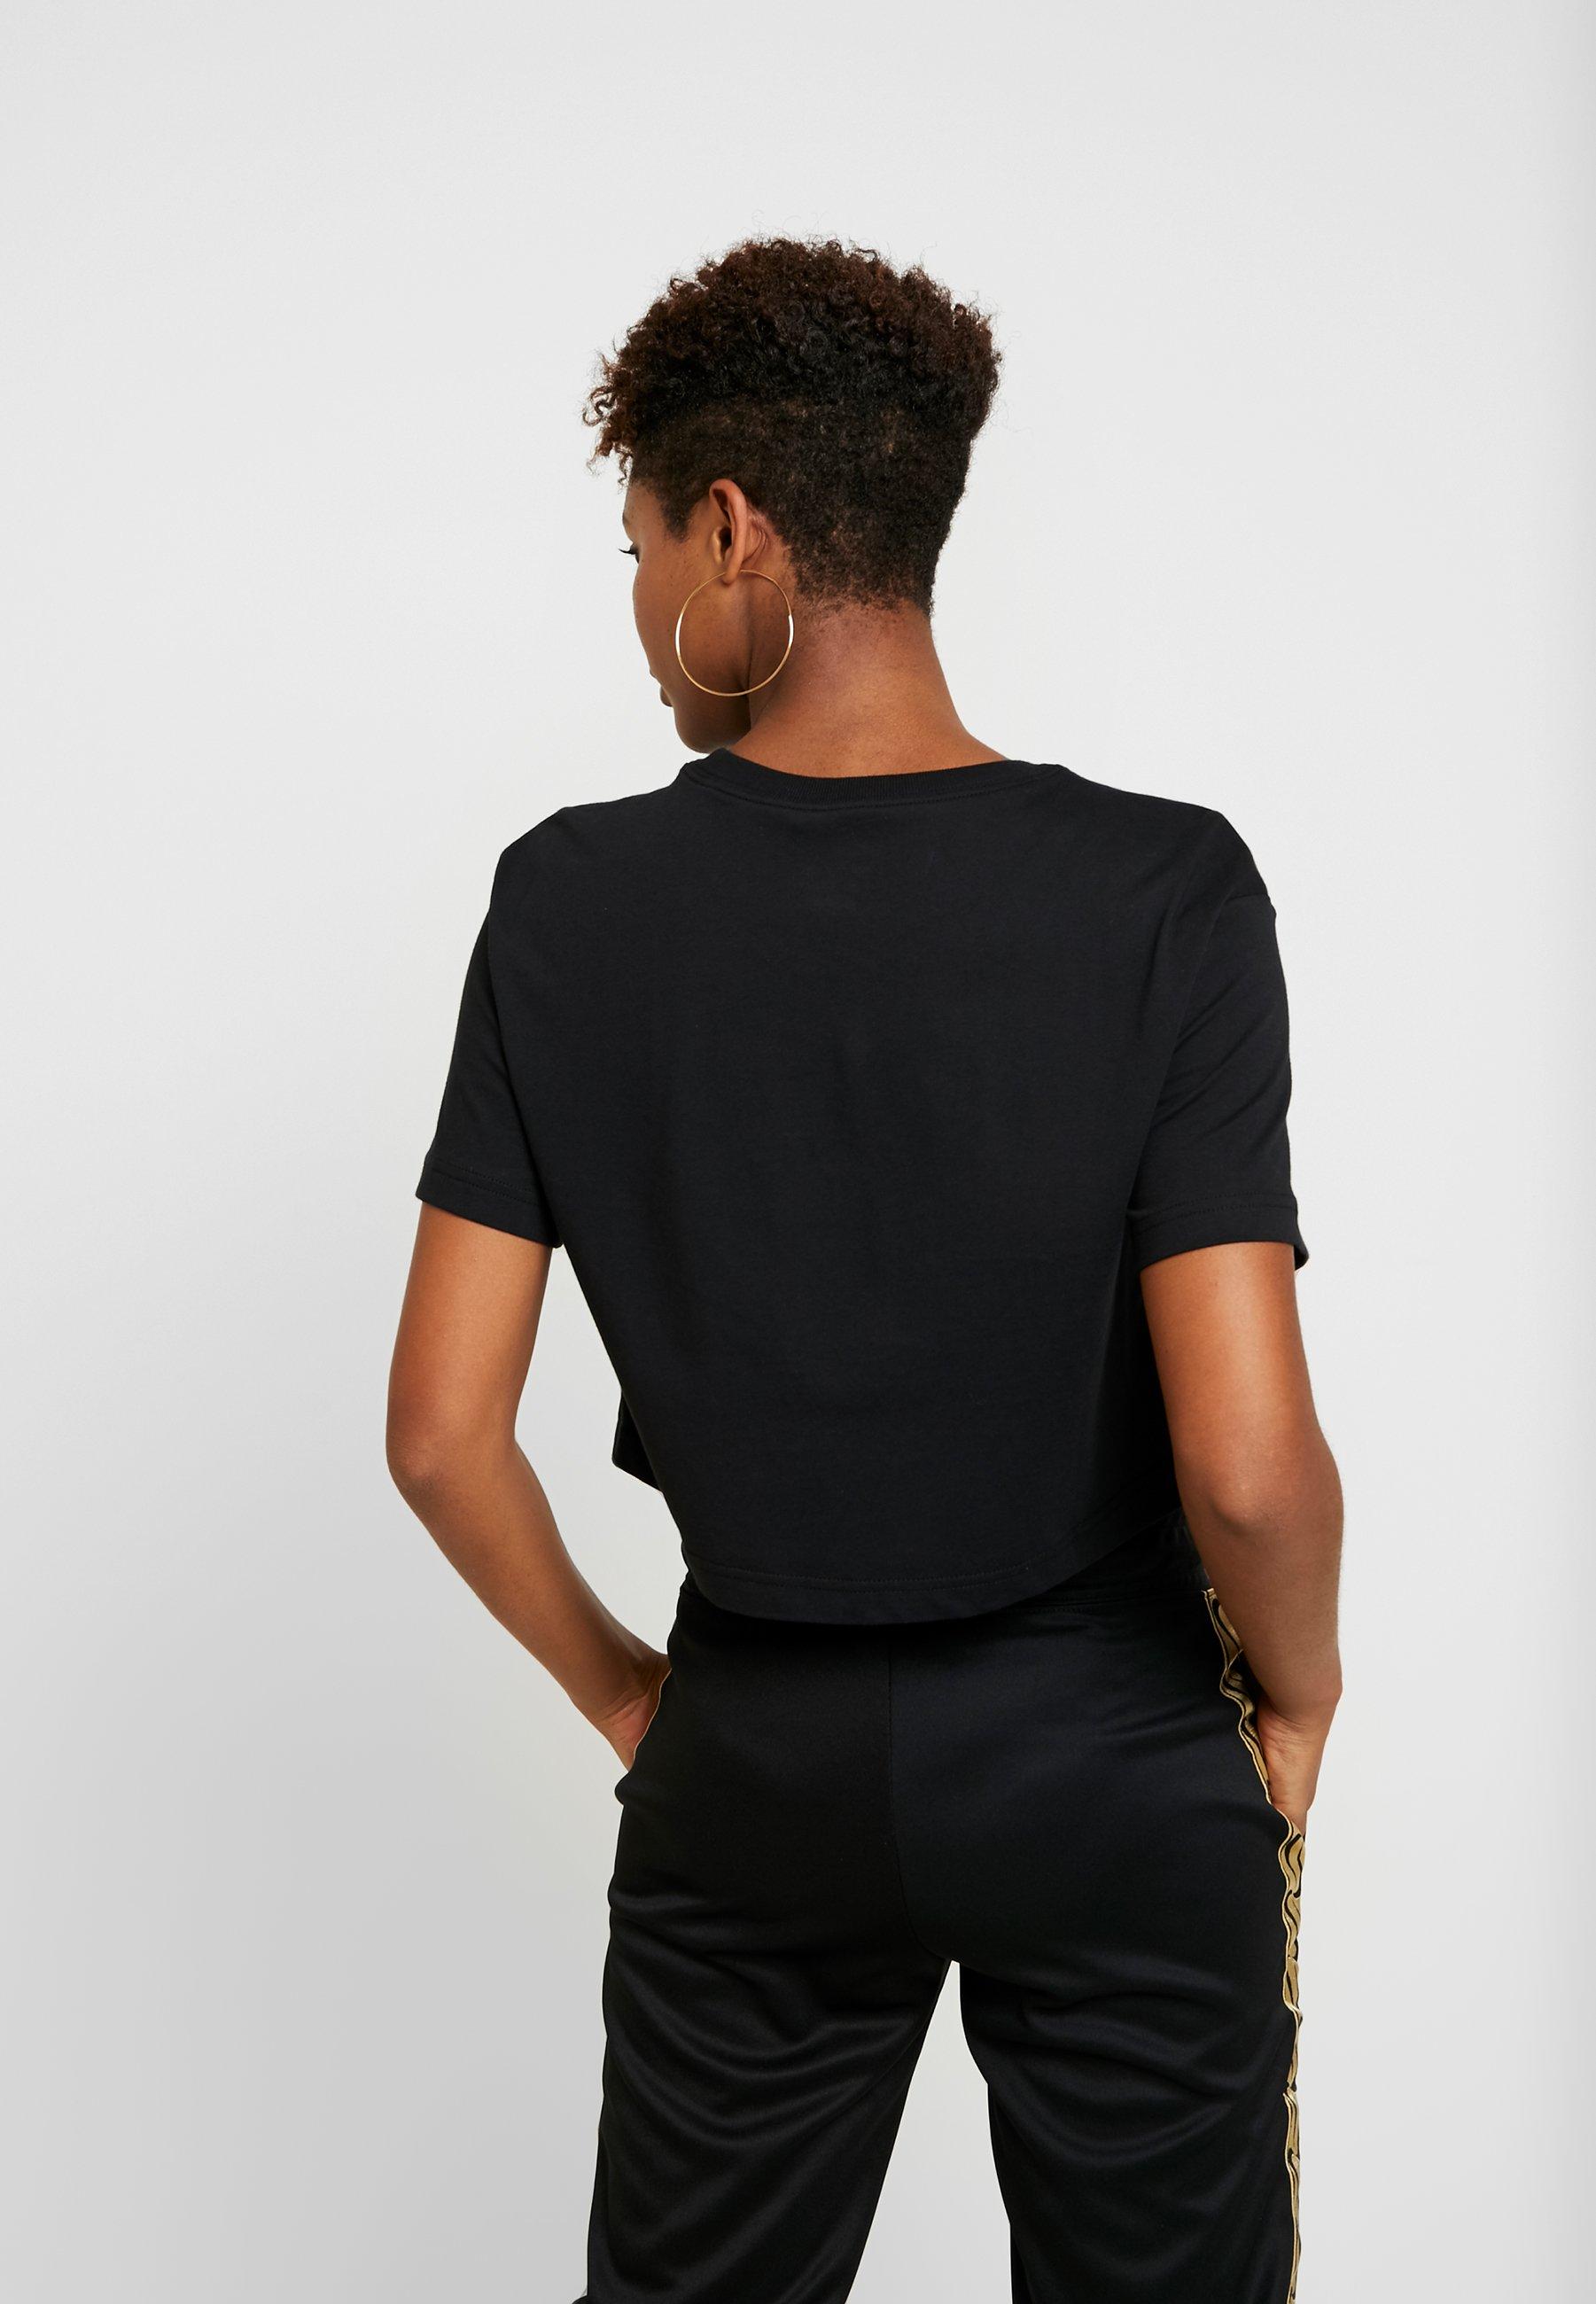 Sportswear shirt Nike TEE CROP GLITTERT black imprimé Qsthdr